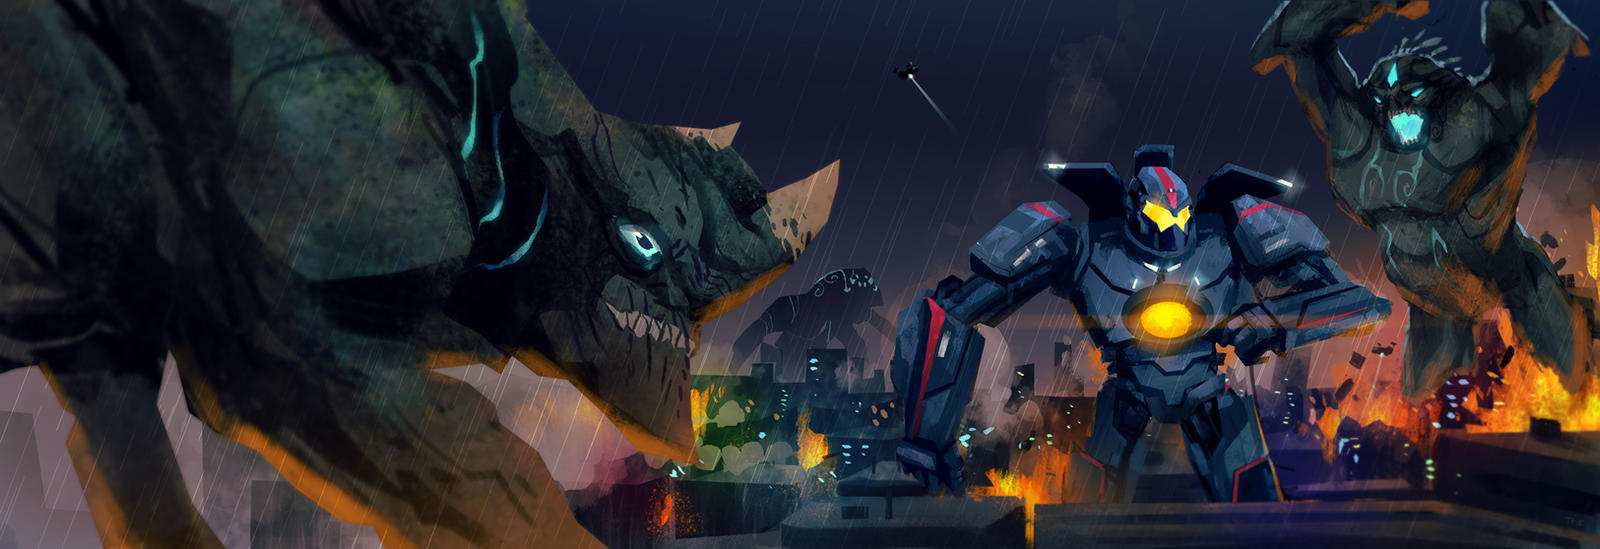 PR Kaiju Attack by Toyebot